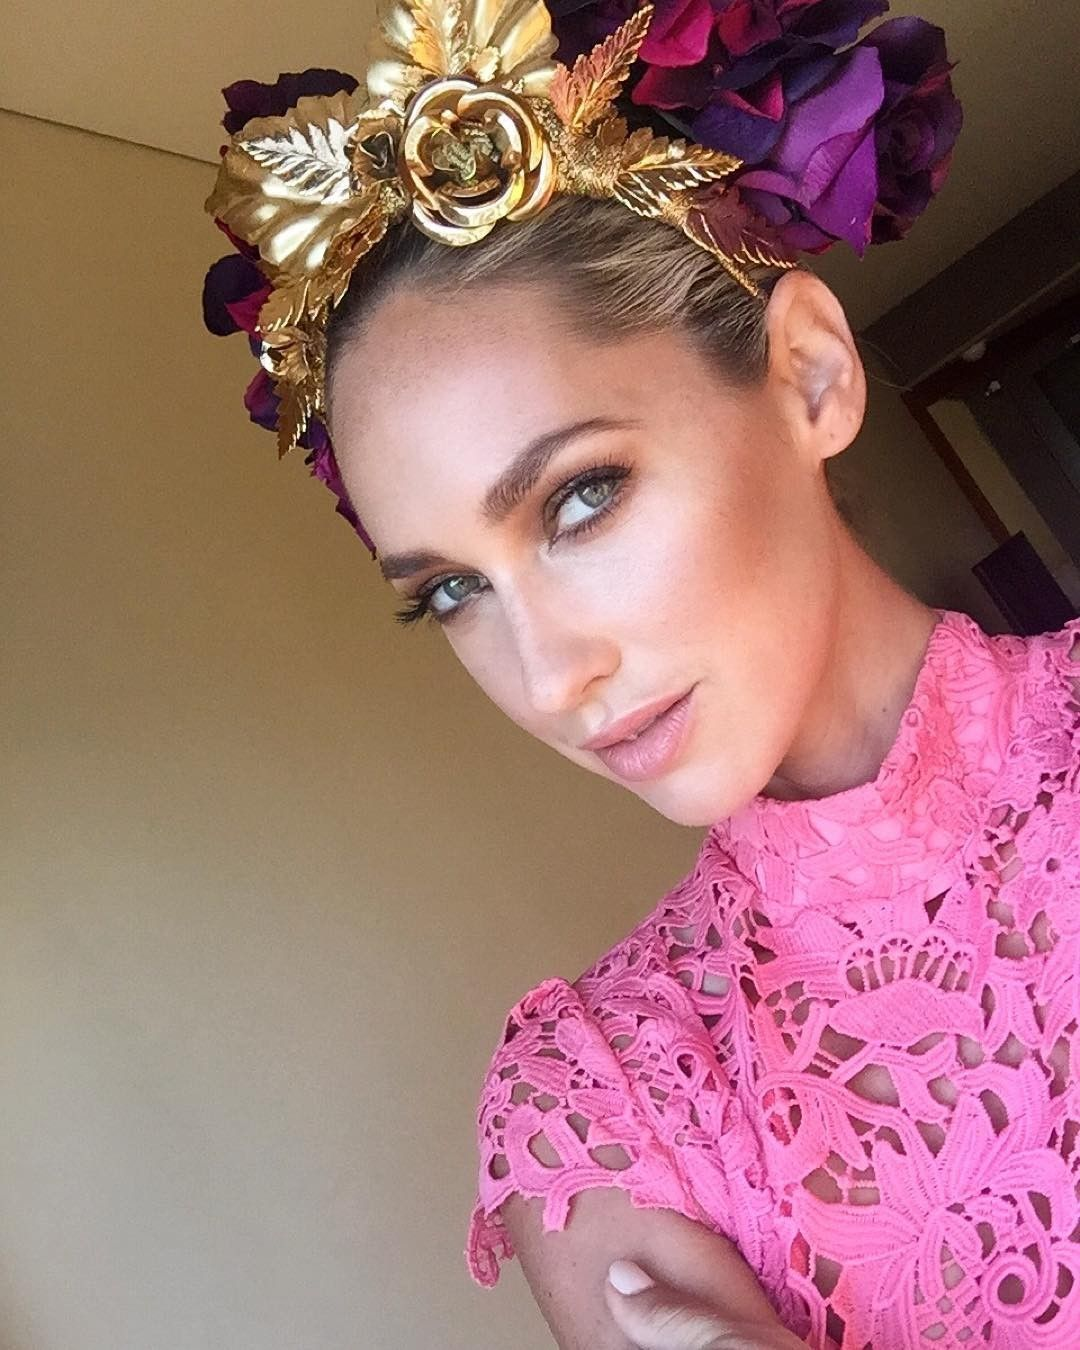 Makeup in 2020 Beauty, Spring racing, Melbourne cup